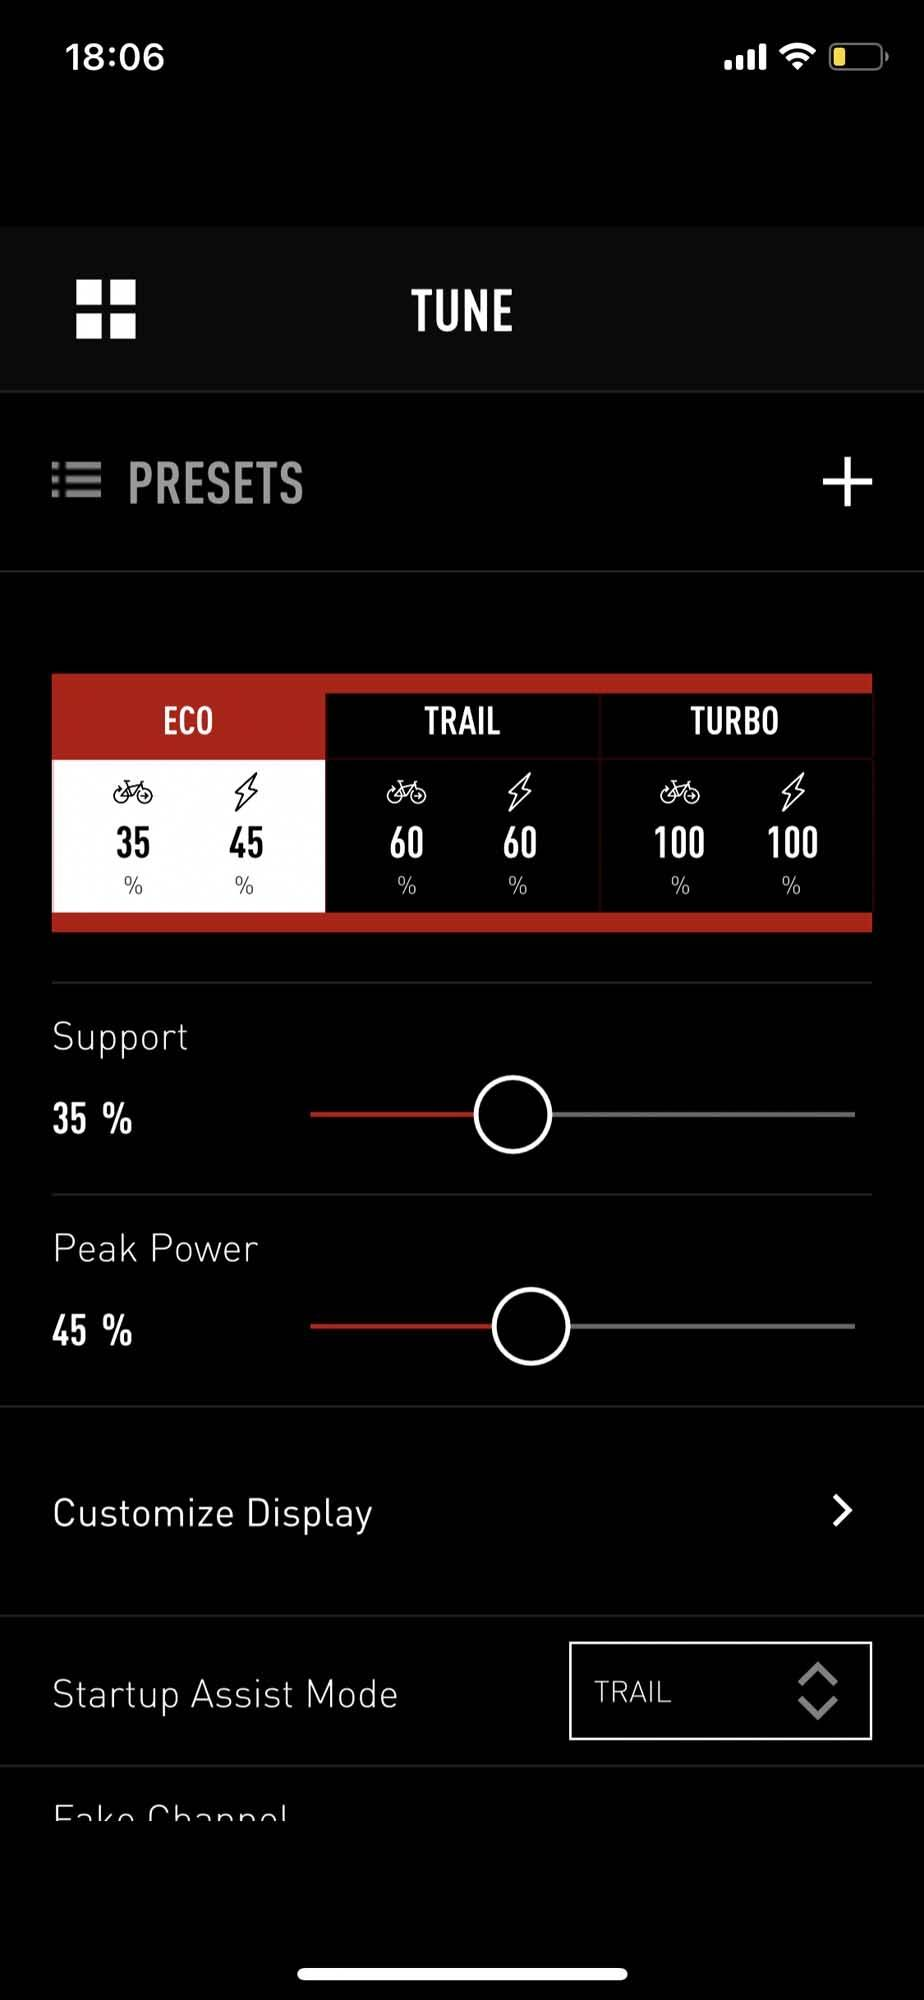 elsykkel specialized mission control app